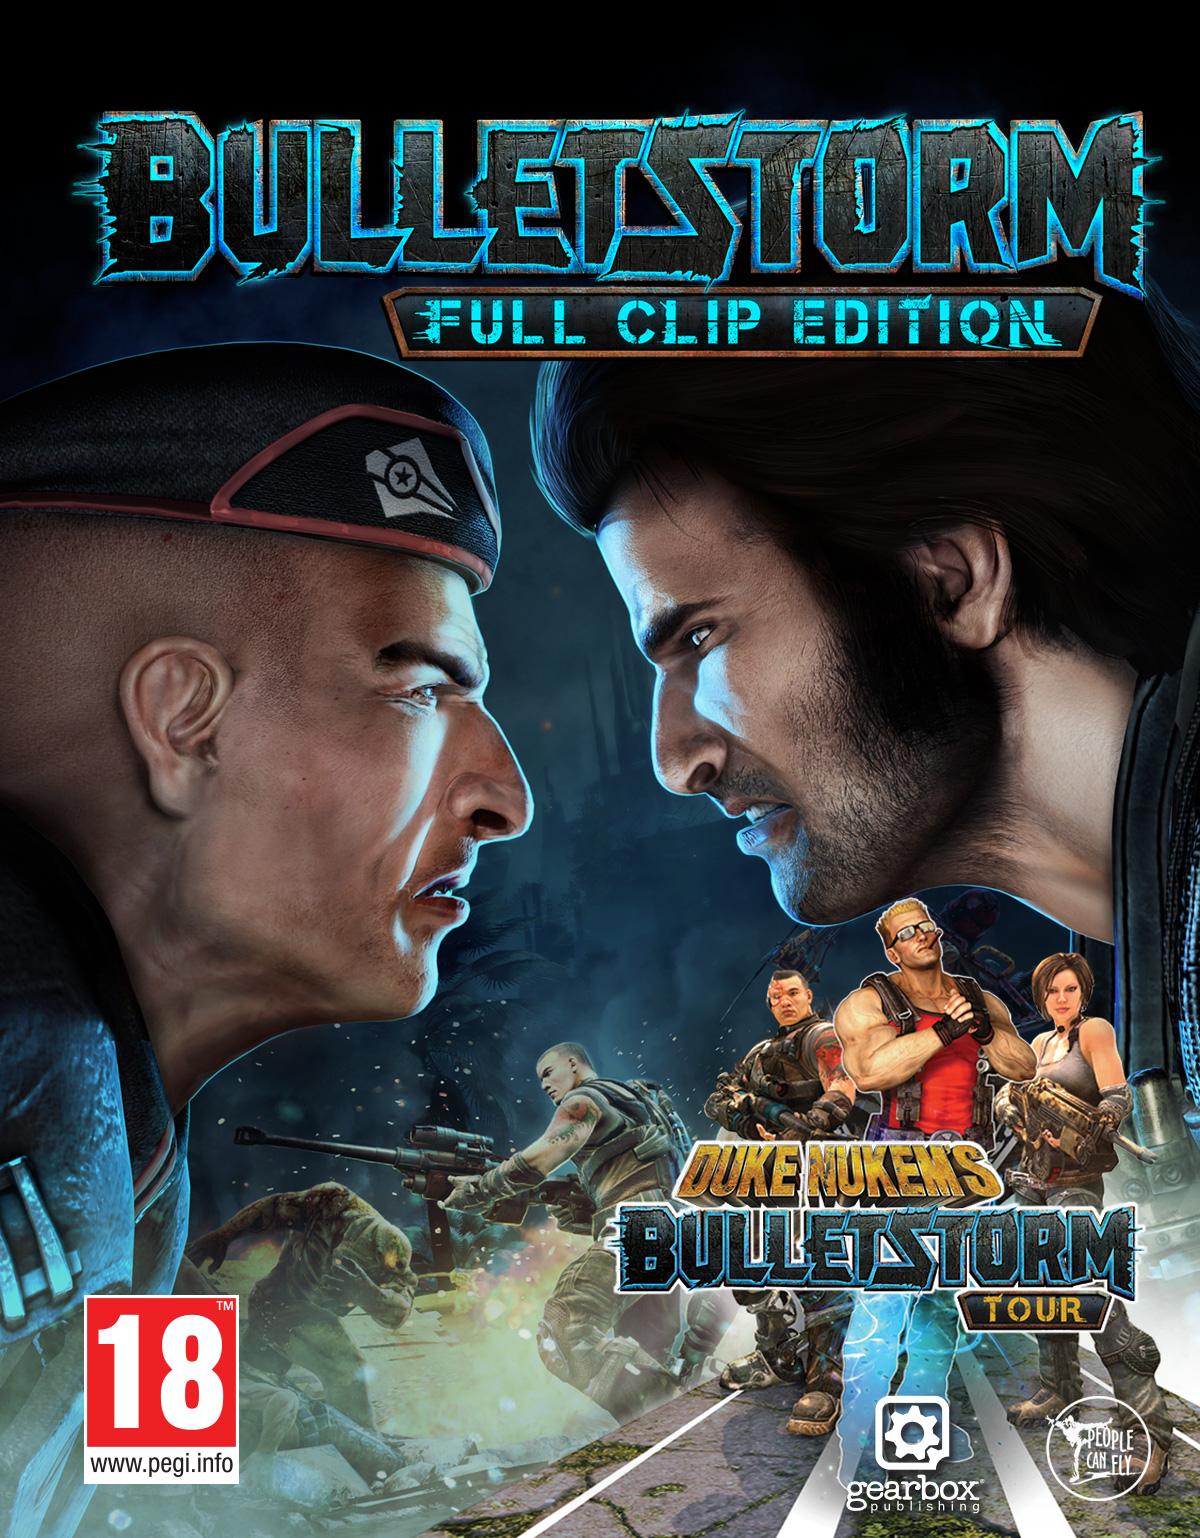 Bulletstorm: Full Clip Edition Duke Nukem Bundle (PC) DIGITÁLIS